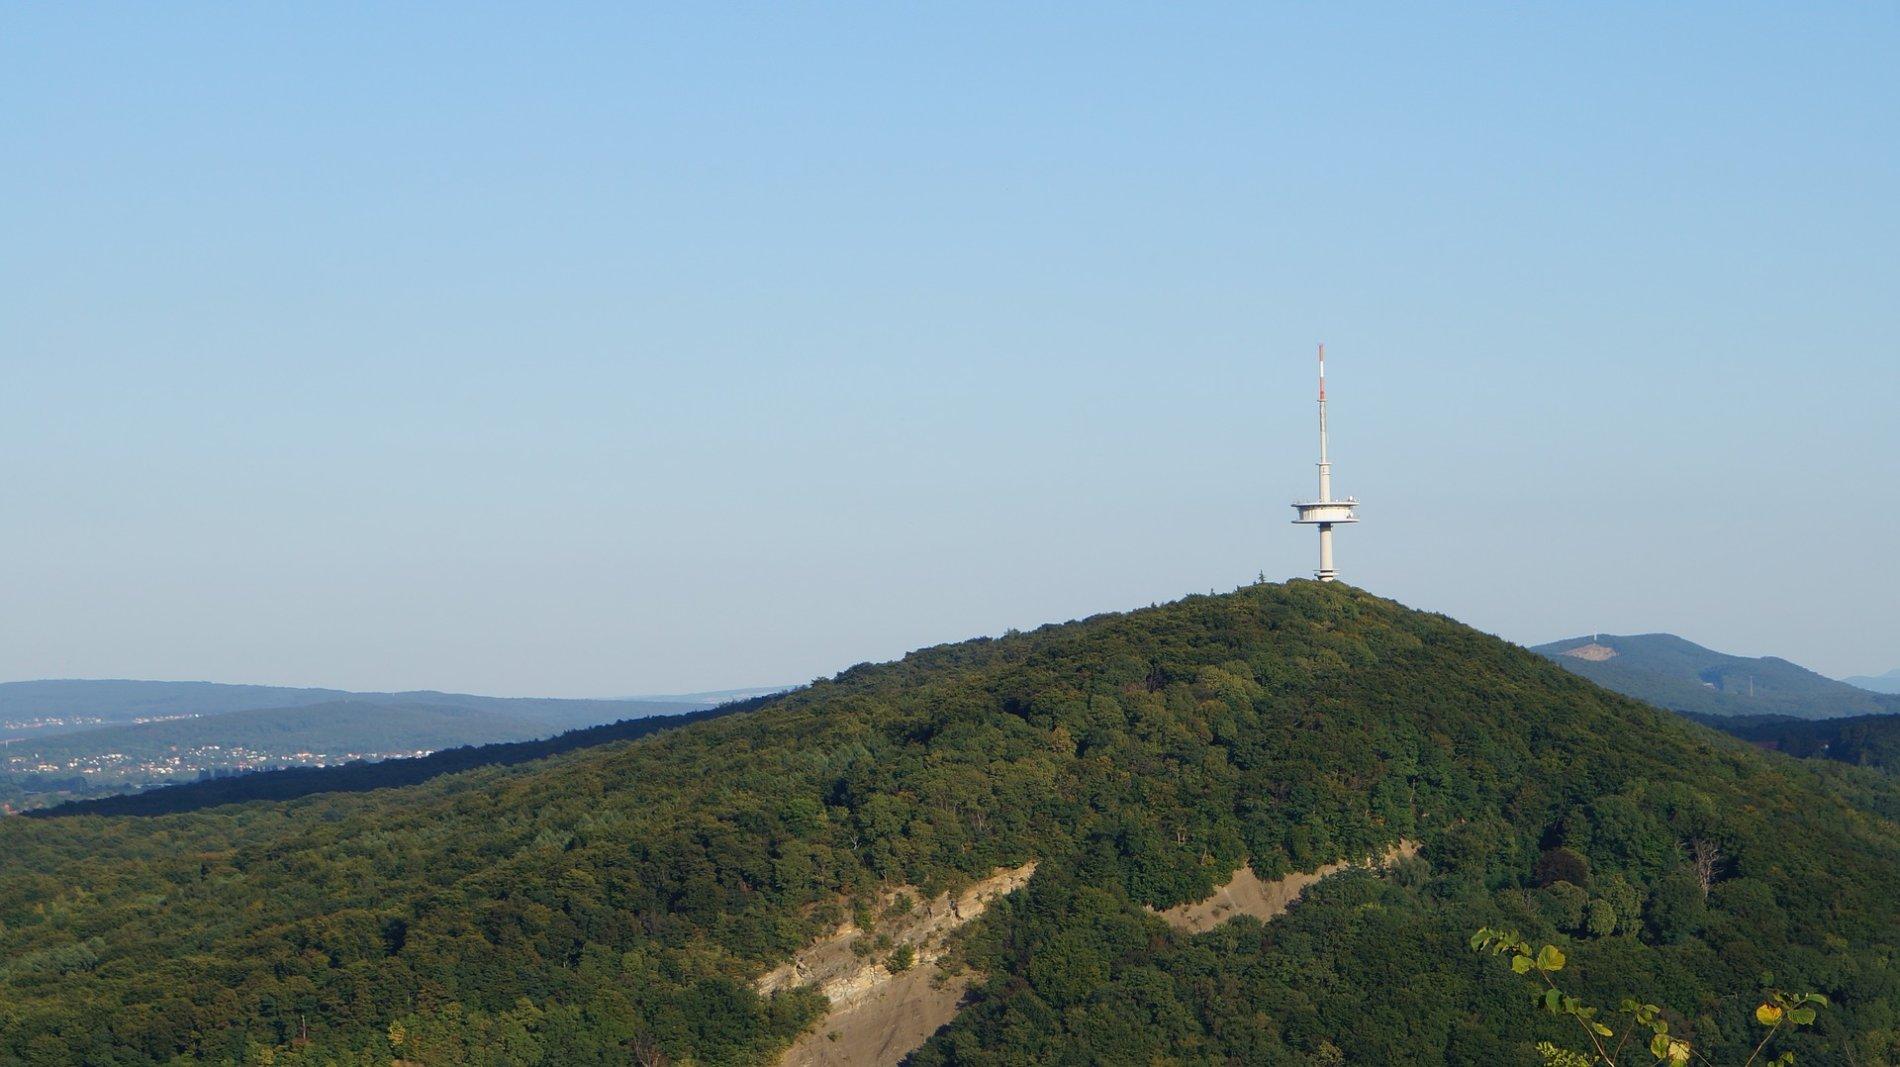 Fernsehturm Porta Westfalica